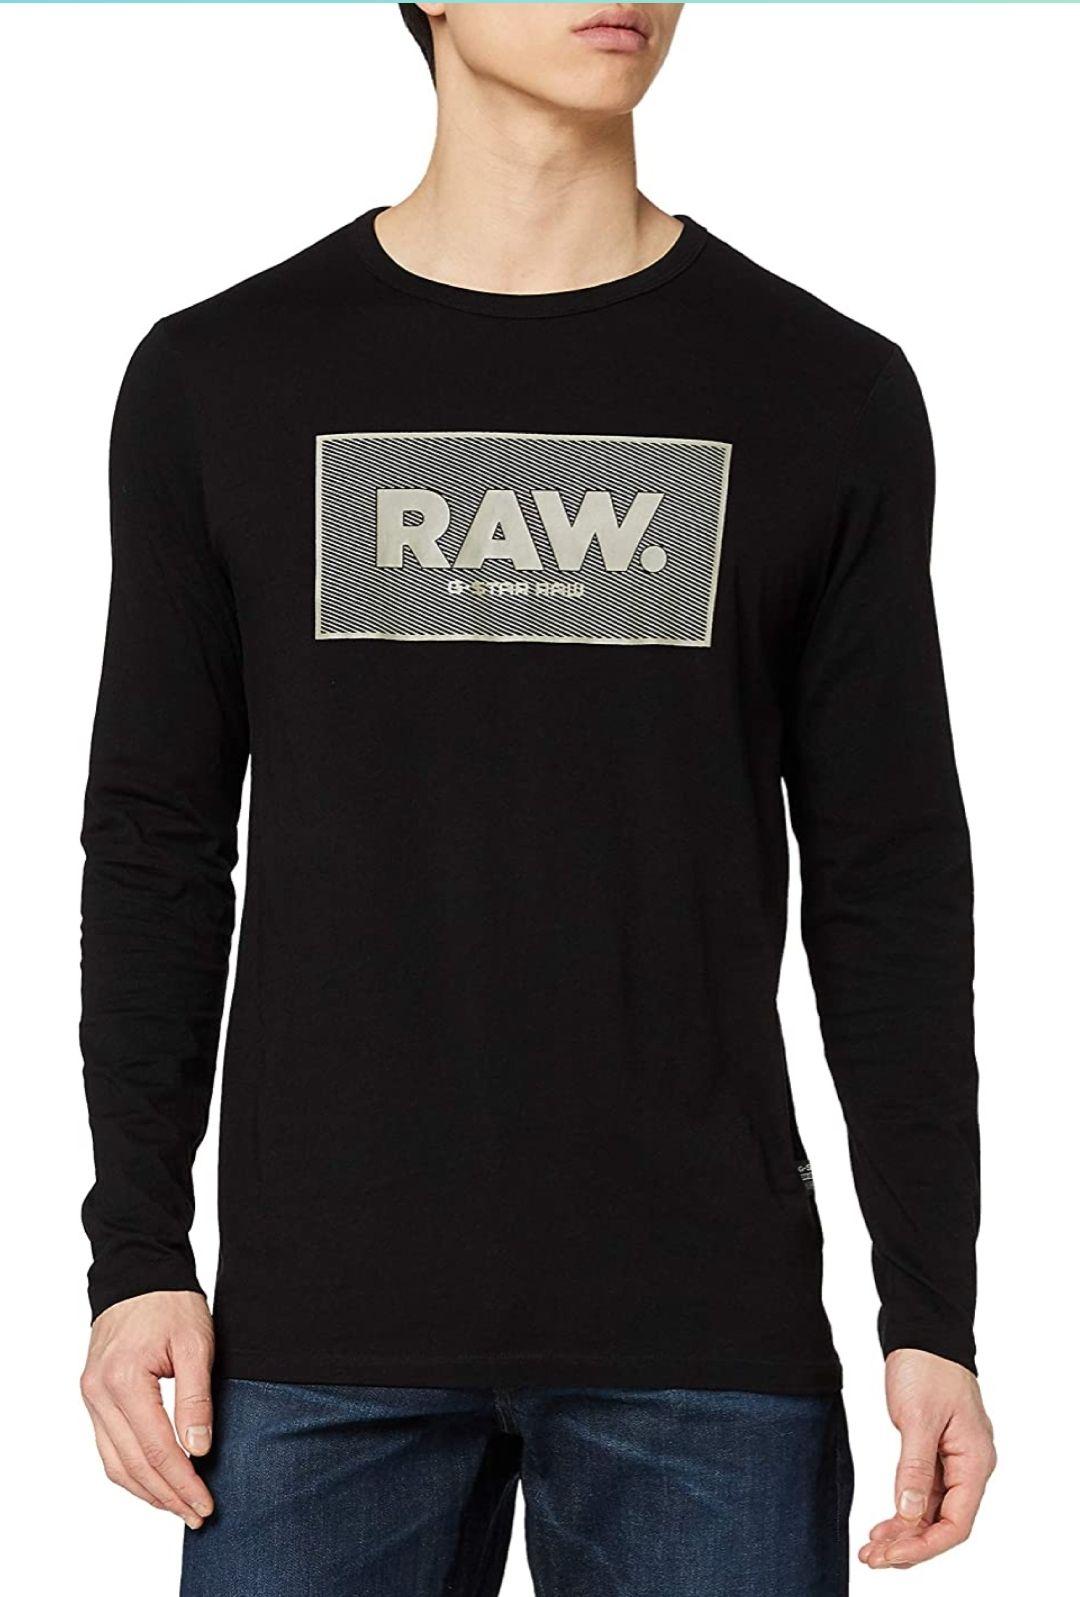 Reco ropa G-star Raw Hombre desde 9€